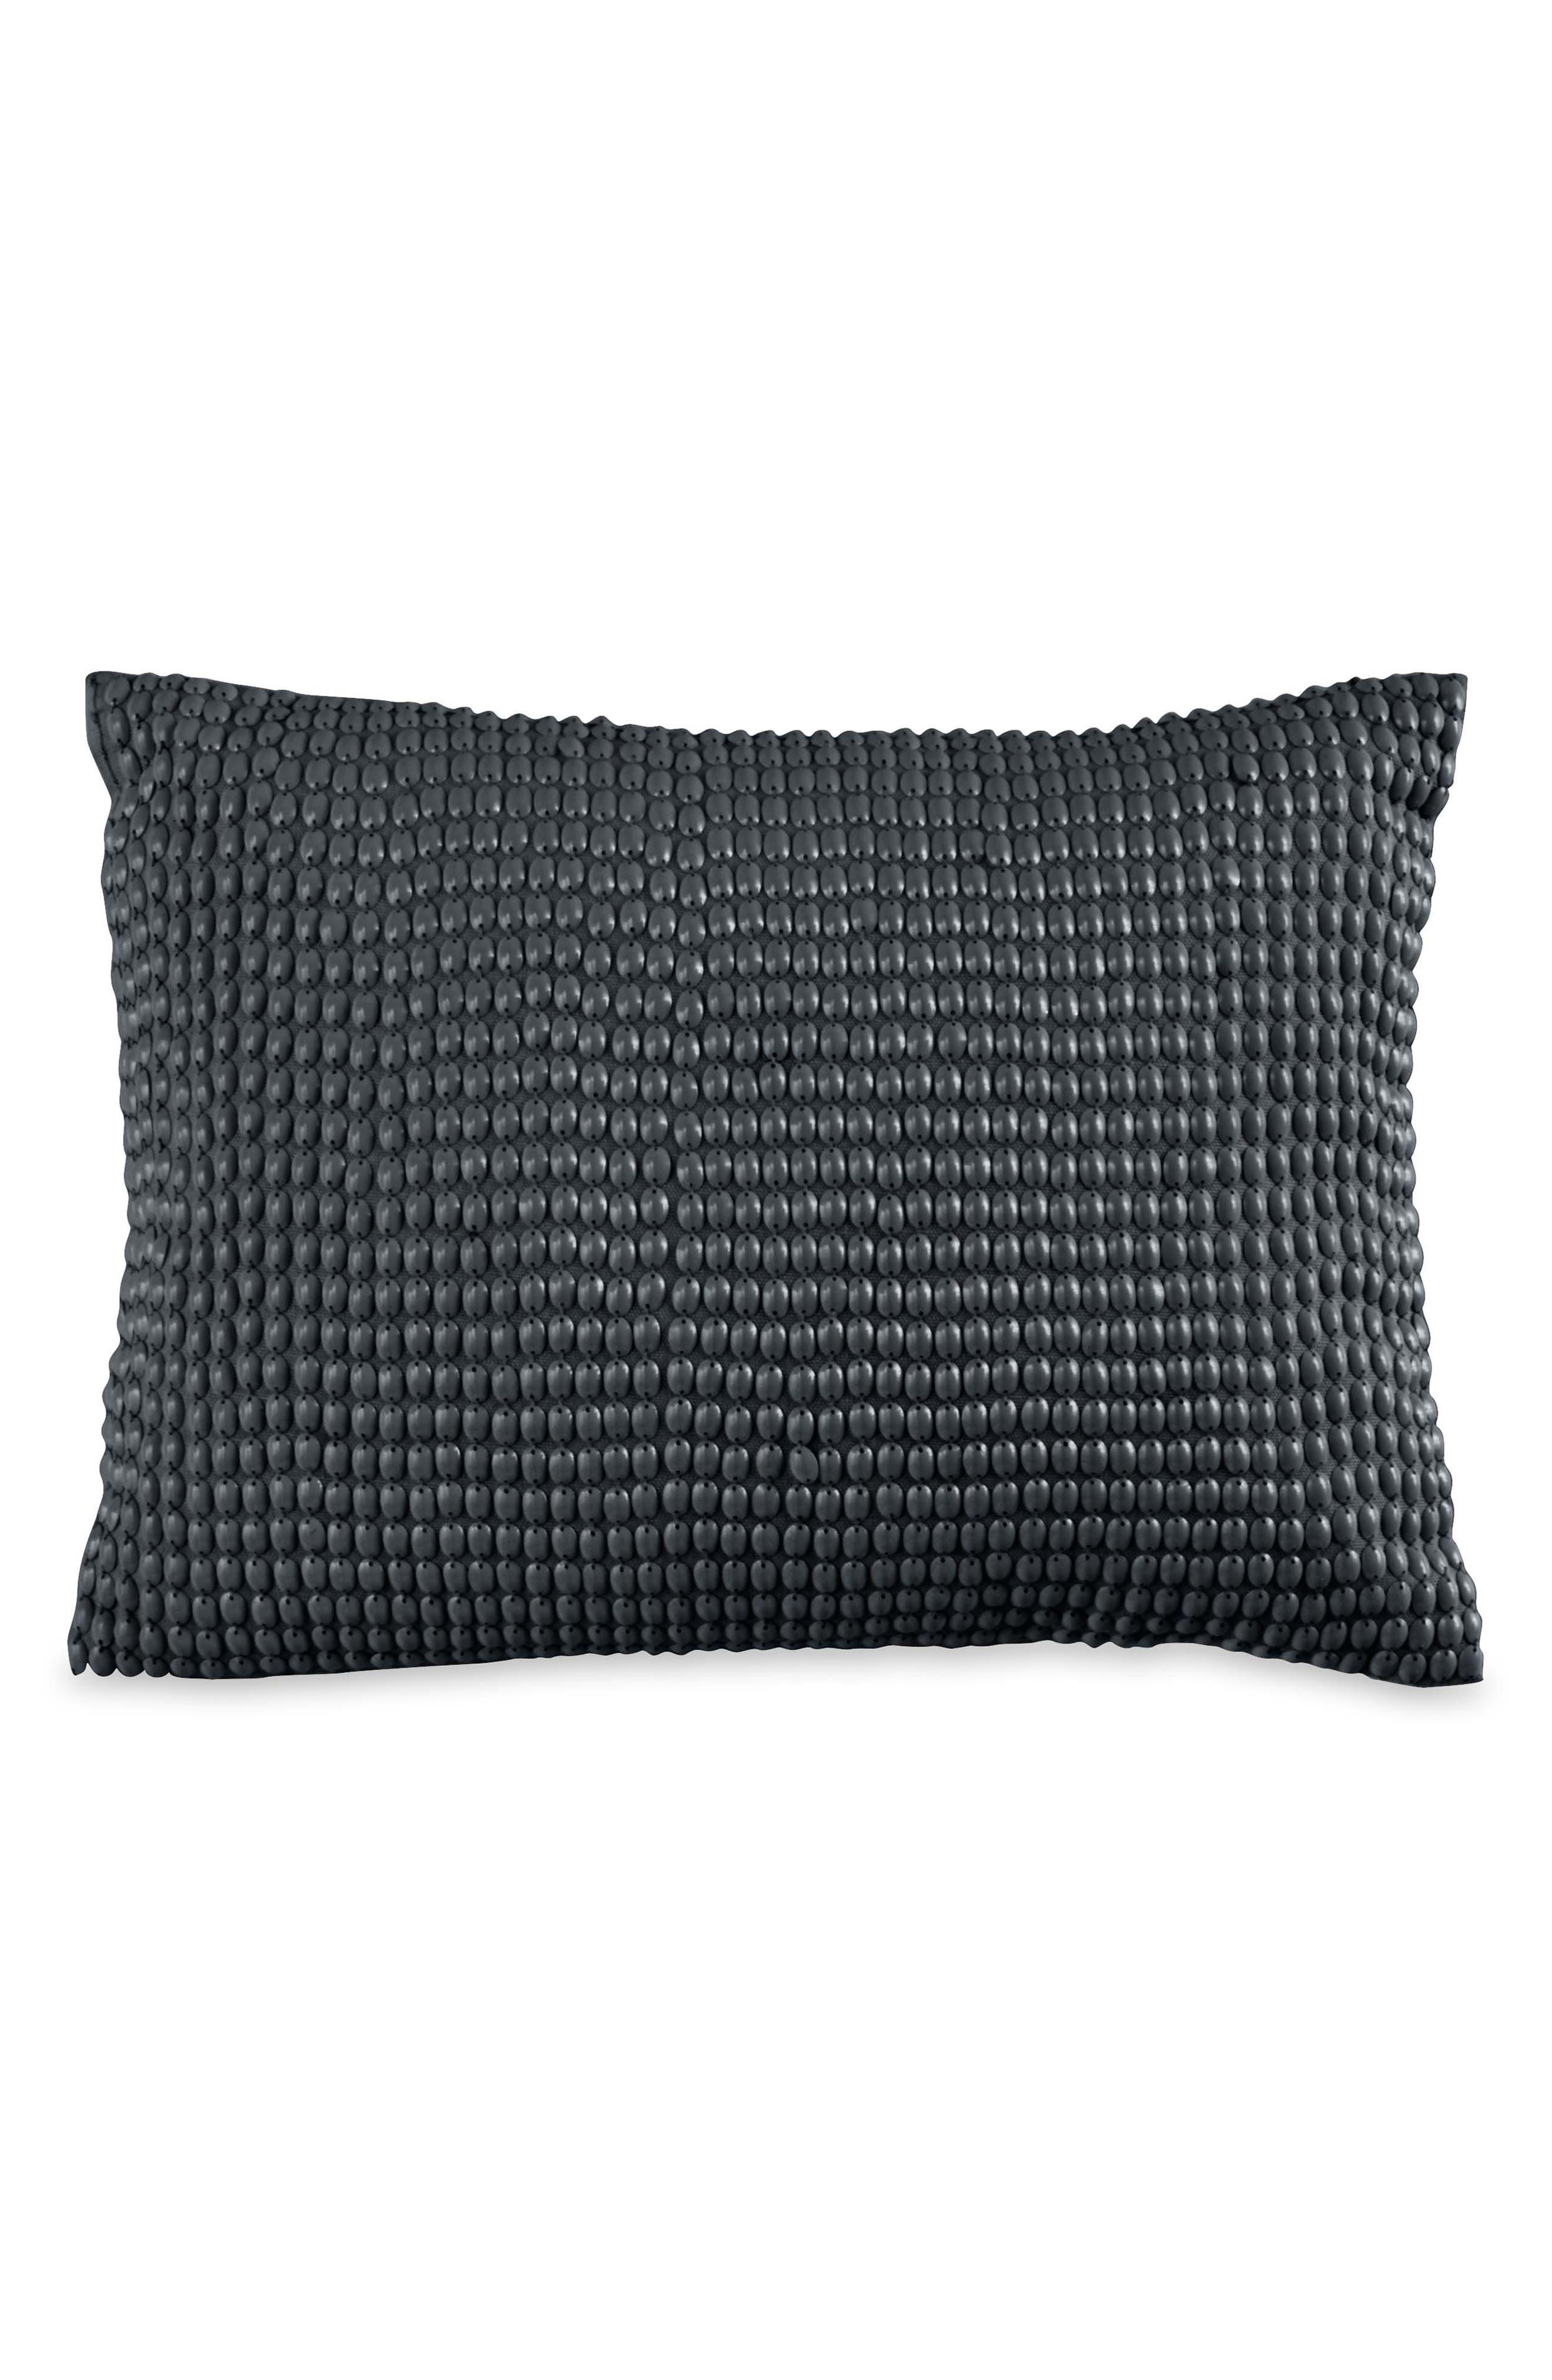 DKNY Metro Matelassé Pillow